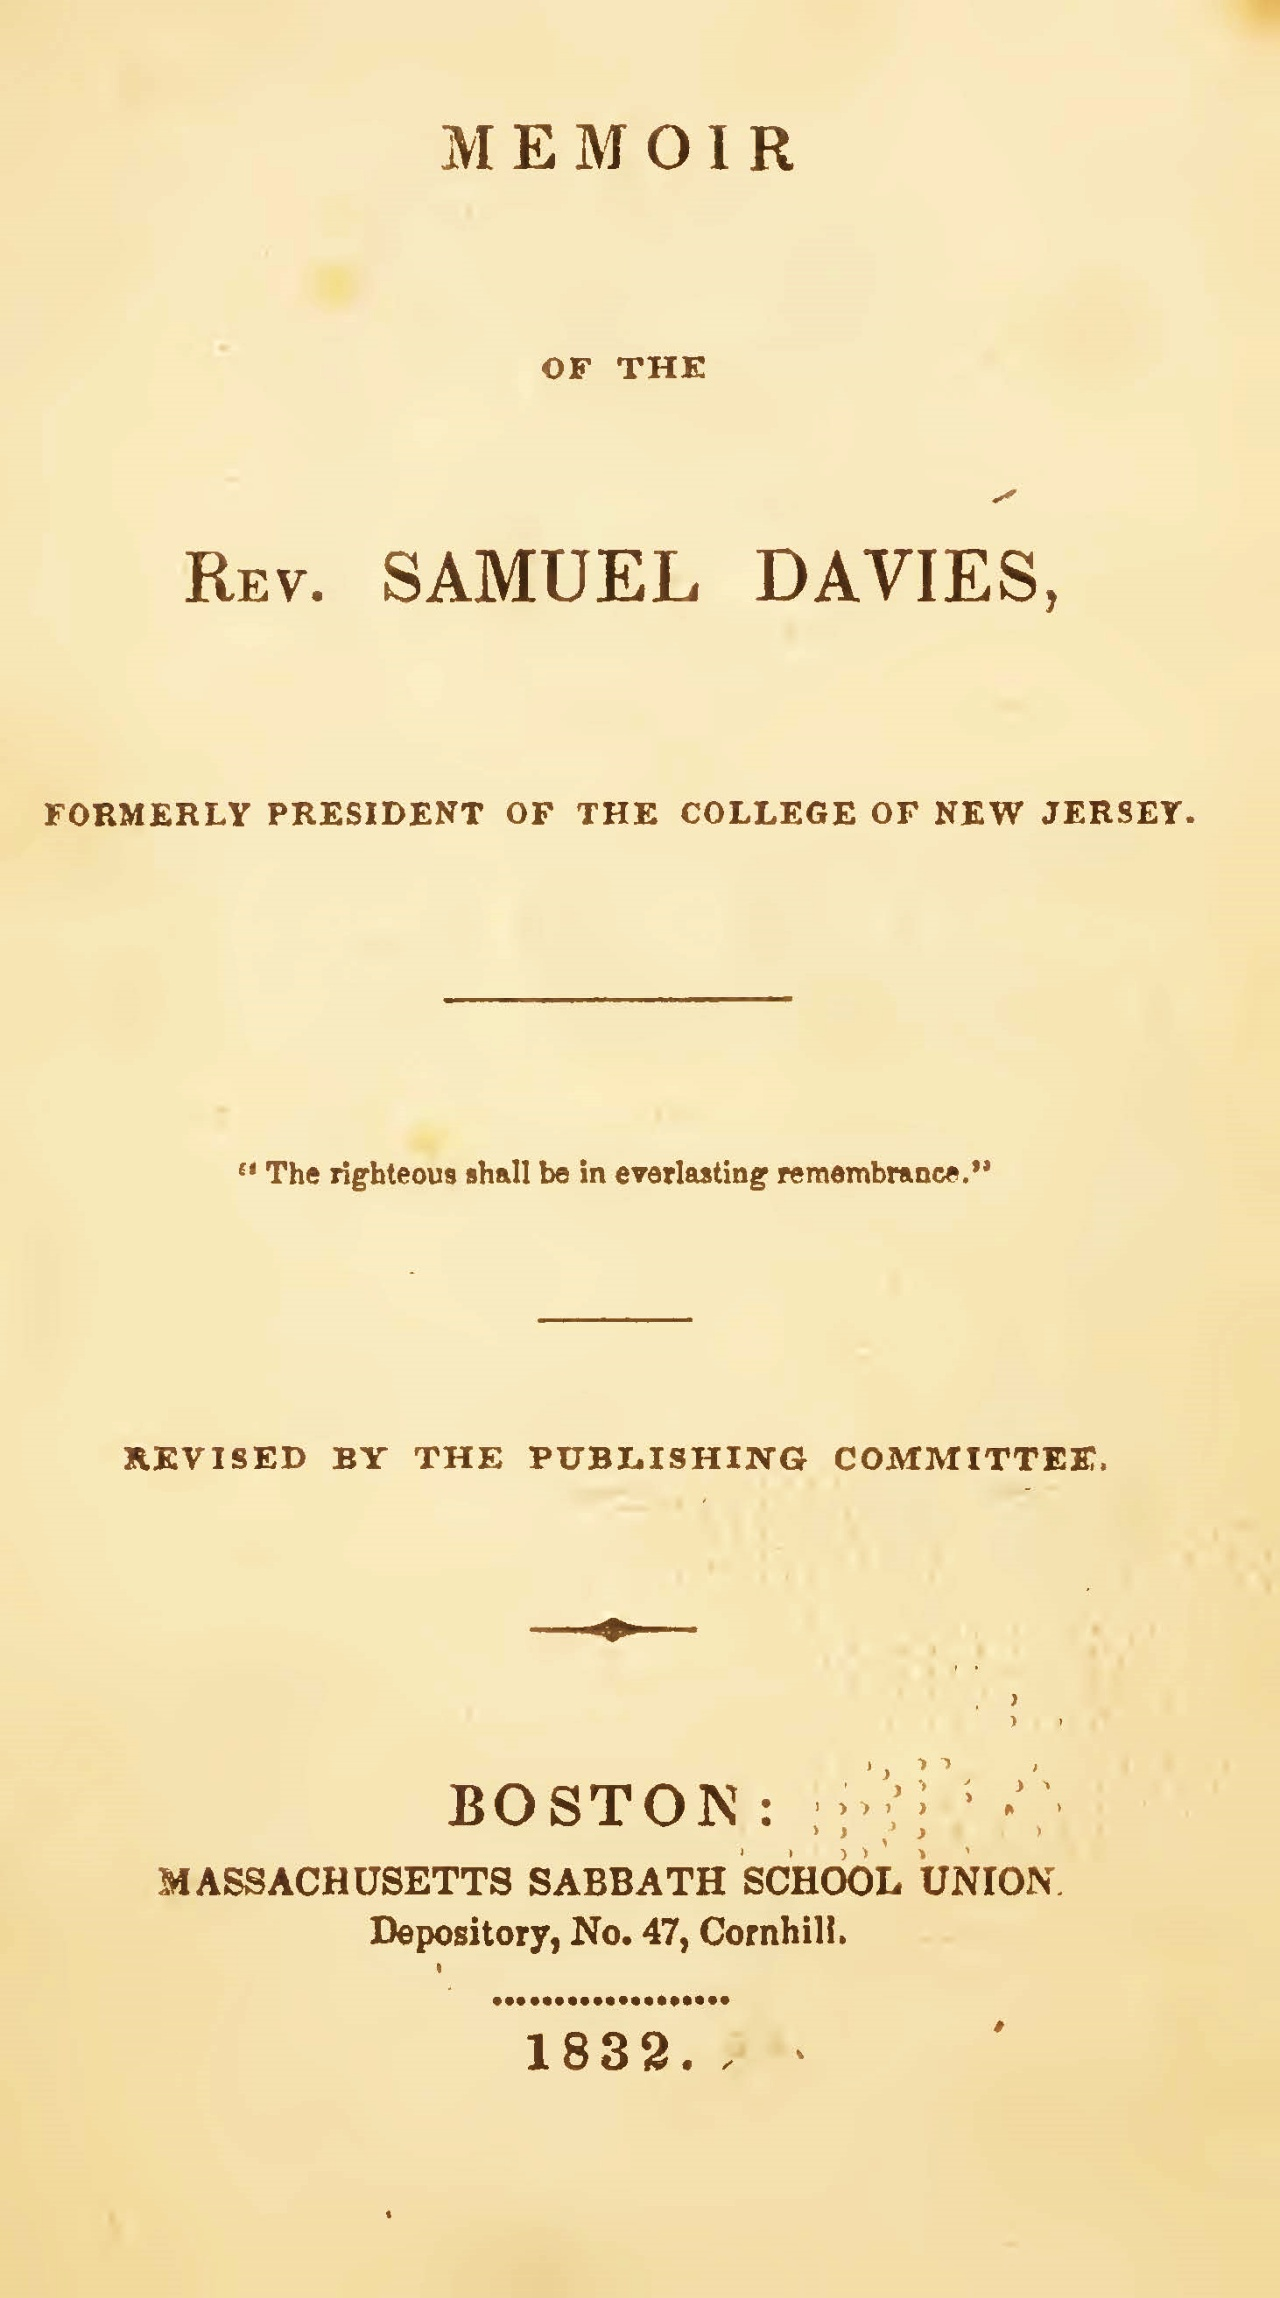 Rice, John Holt, Memoir of the Rev. Samuel Davies Title Page.jpg